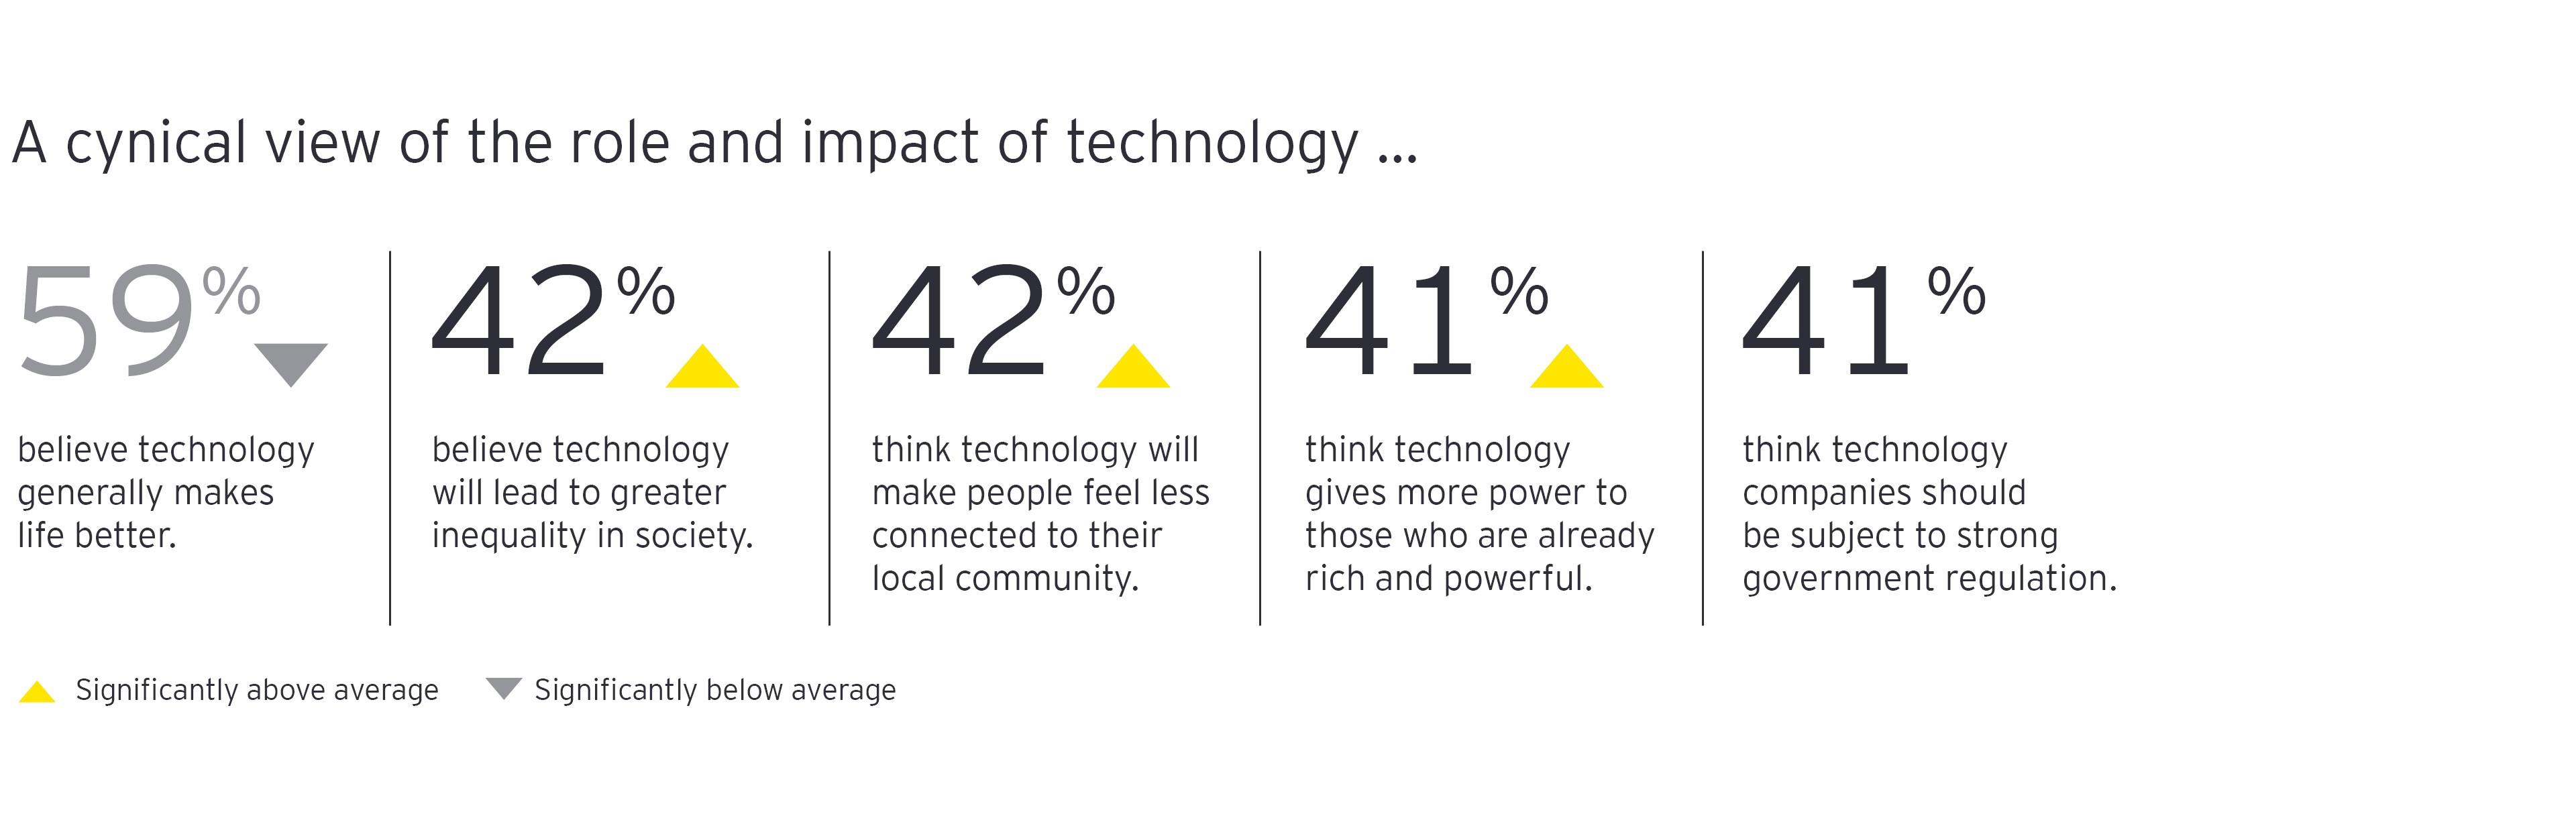 Connected citizens tech skeptics chart 5